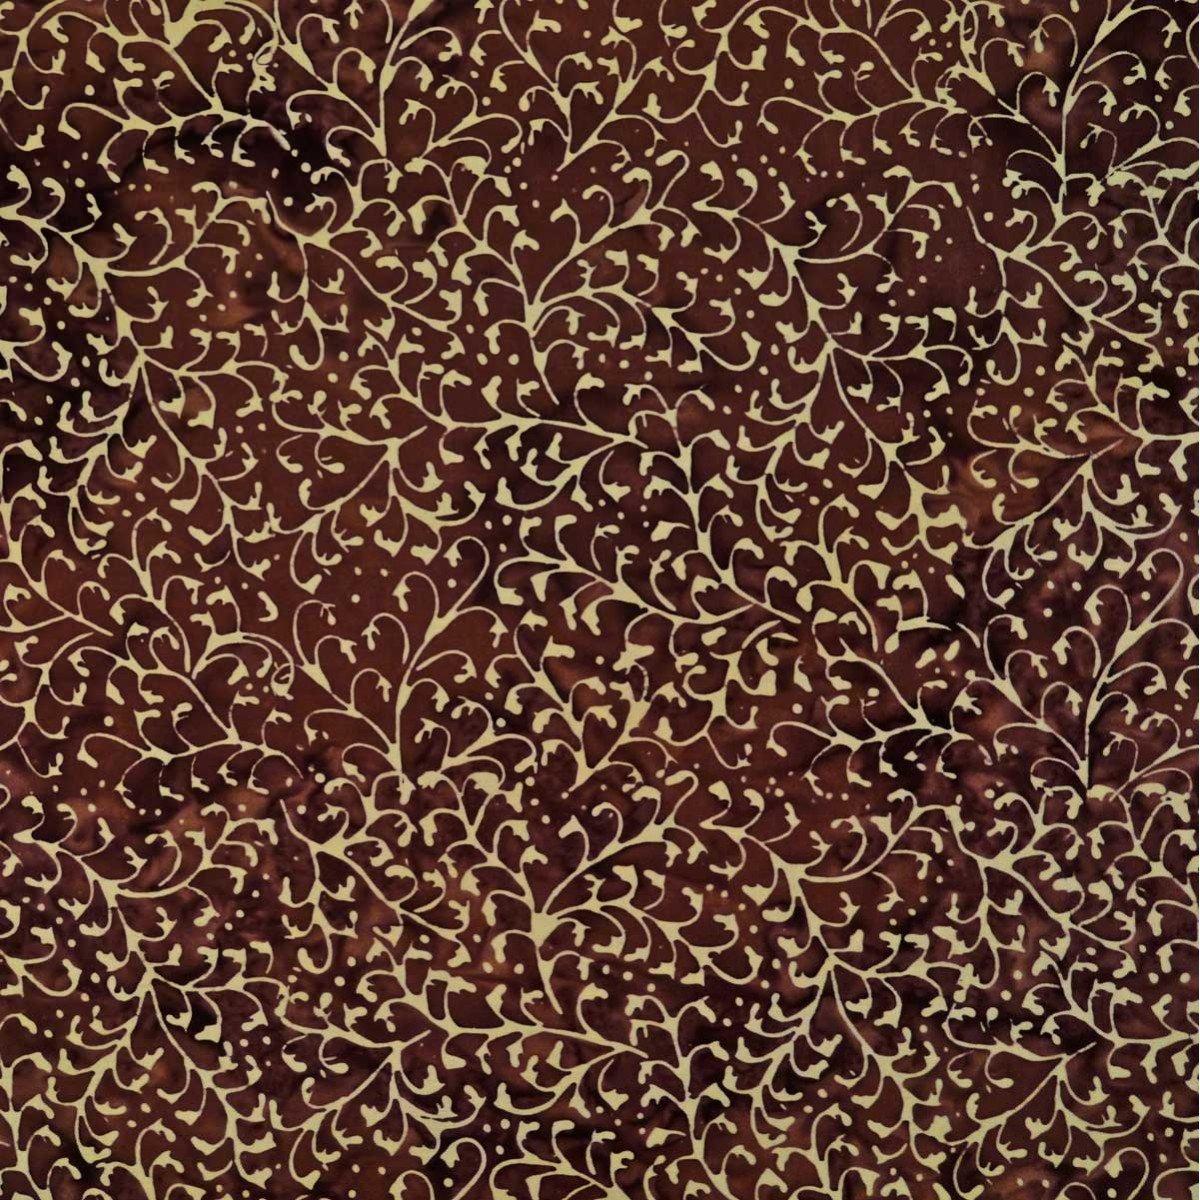 Batik by Mirah, Kopi